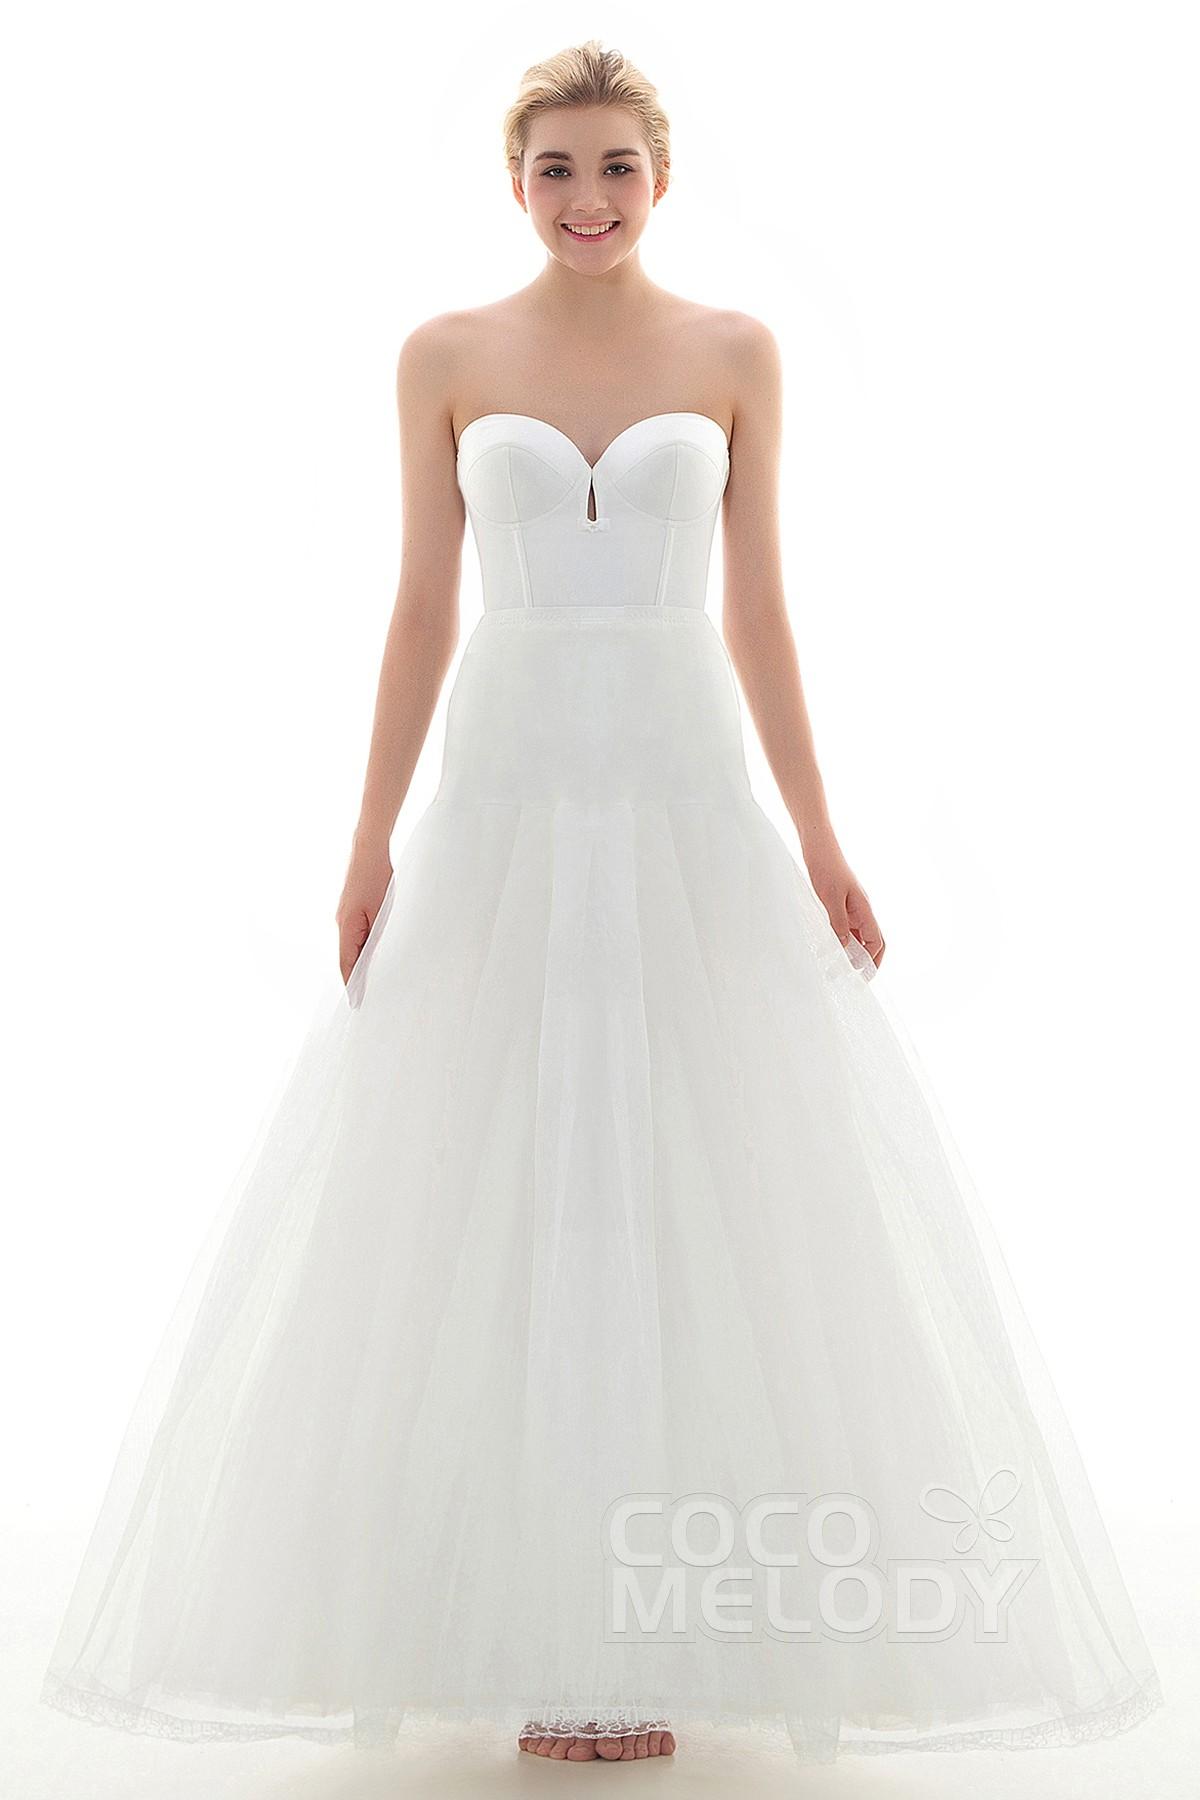 A-Line Floor-Length Medium Fullness Slip Tulle Wedding Petticoats CP001600D